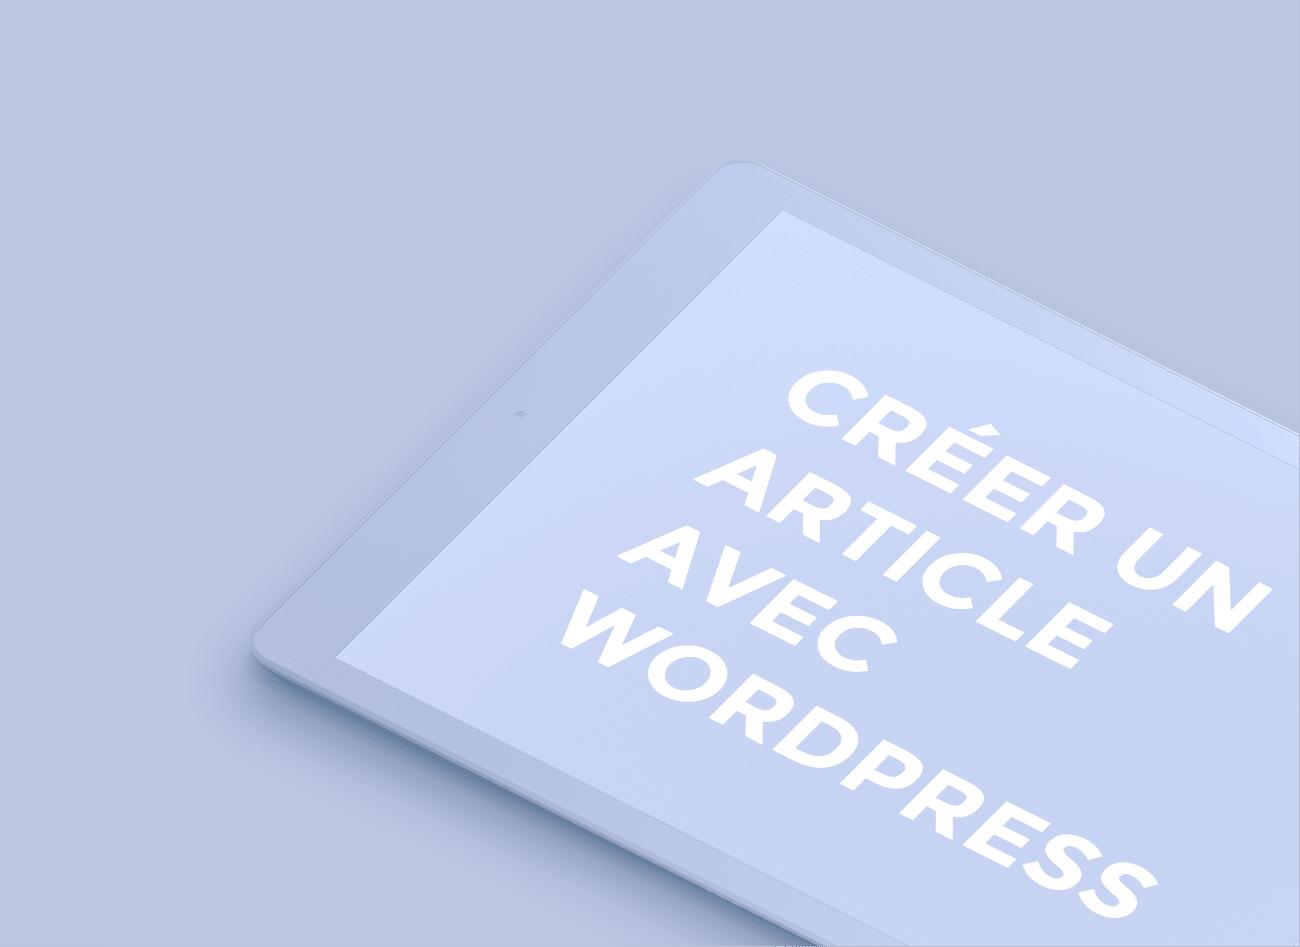 Créer un article avec WordPress